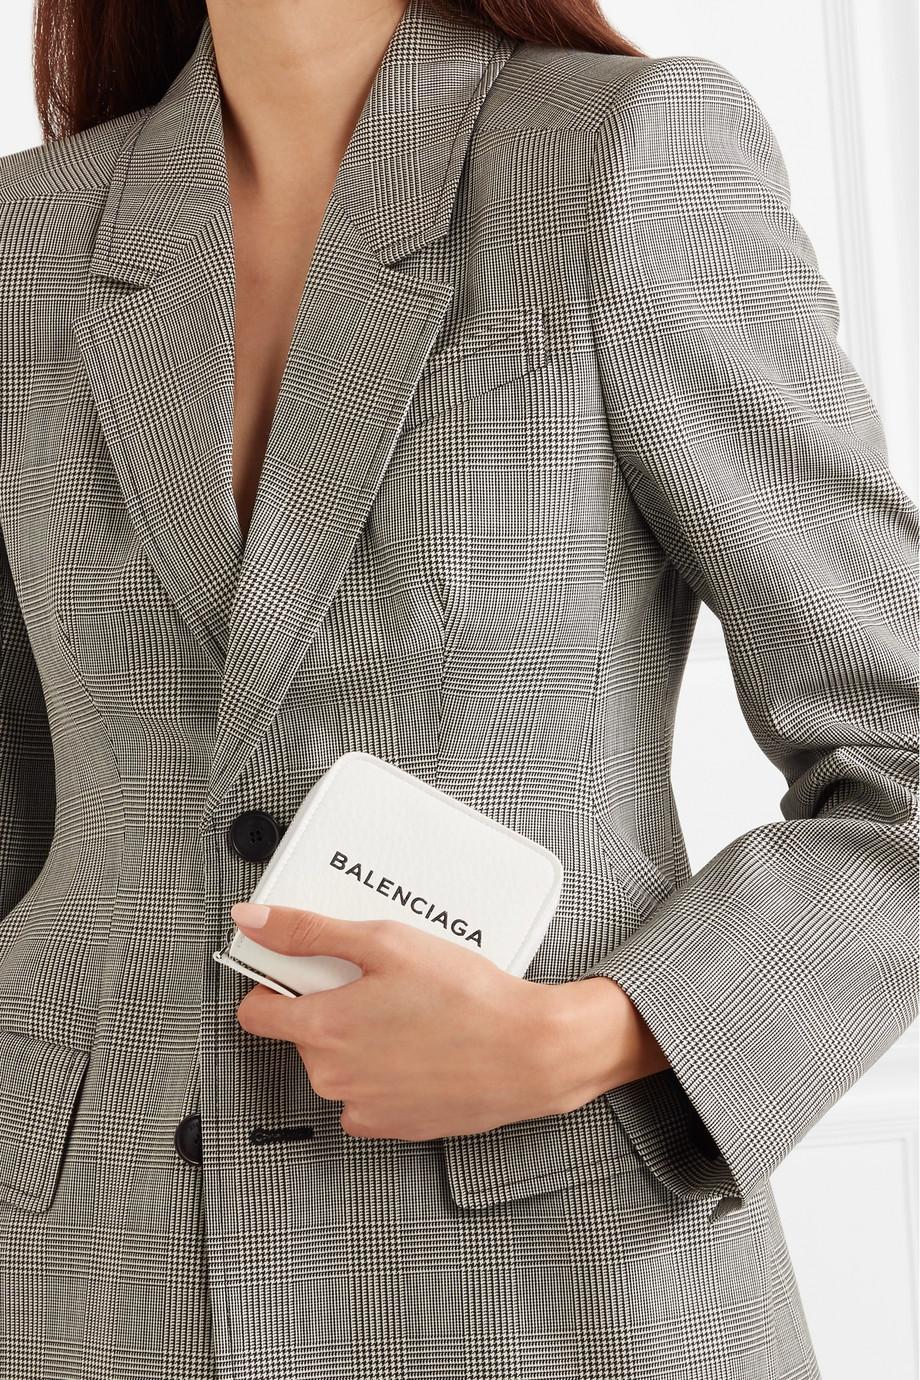 Balenciaga Printed textured-leather wallet